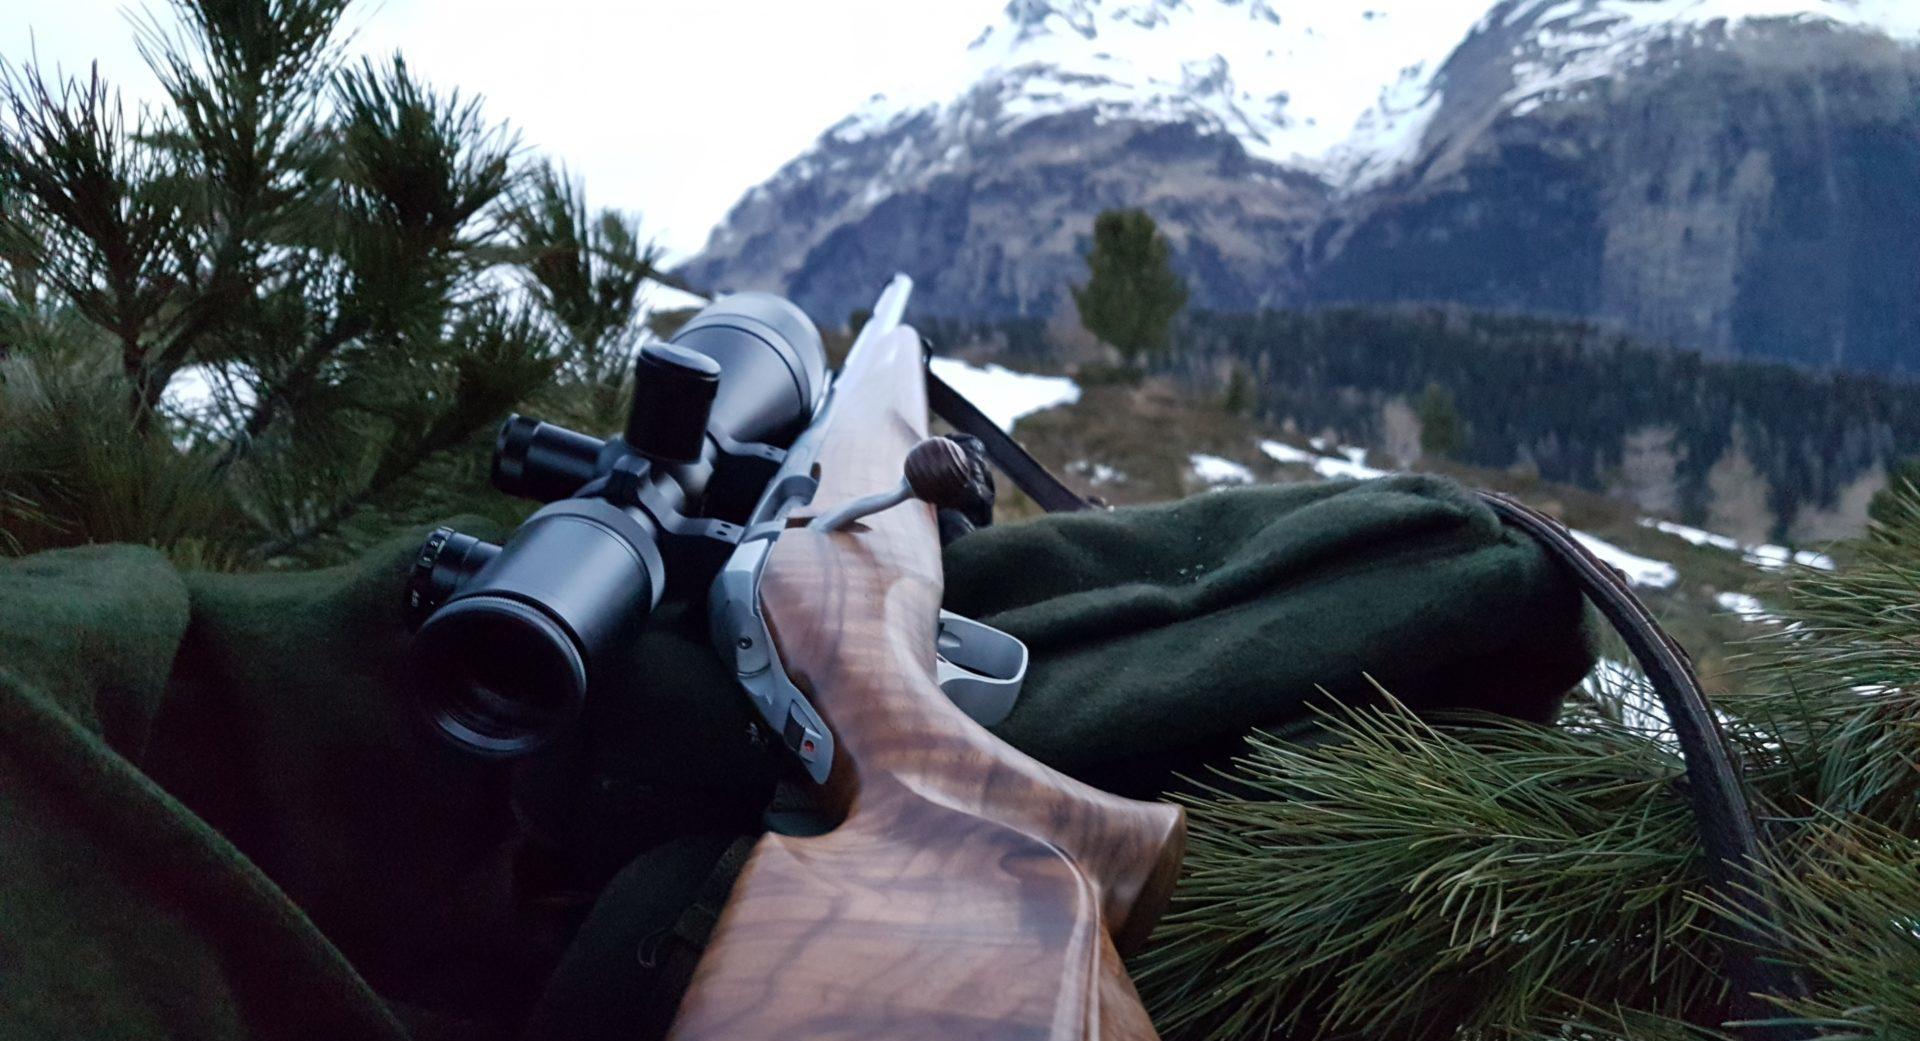 Jagdausübung während Verkehrsbeschränkungen   Tiroler Jägerverband